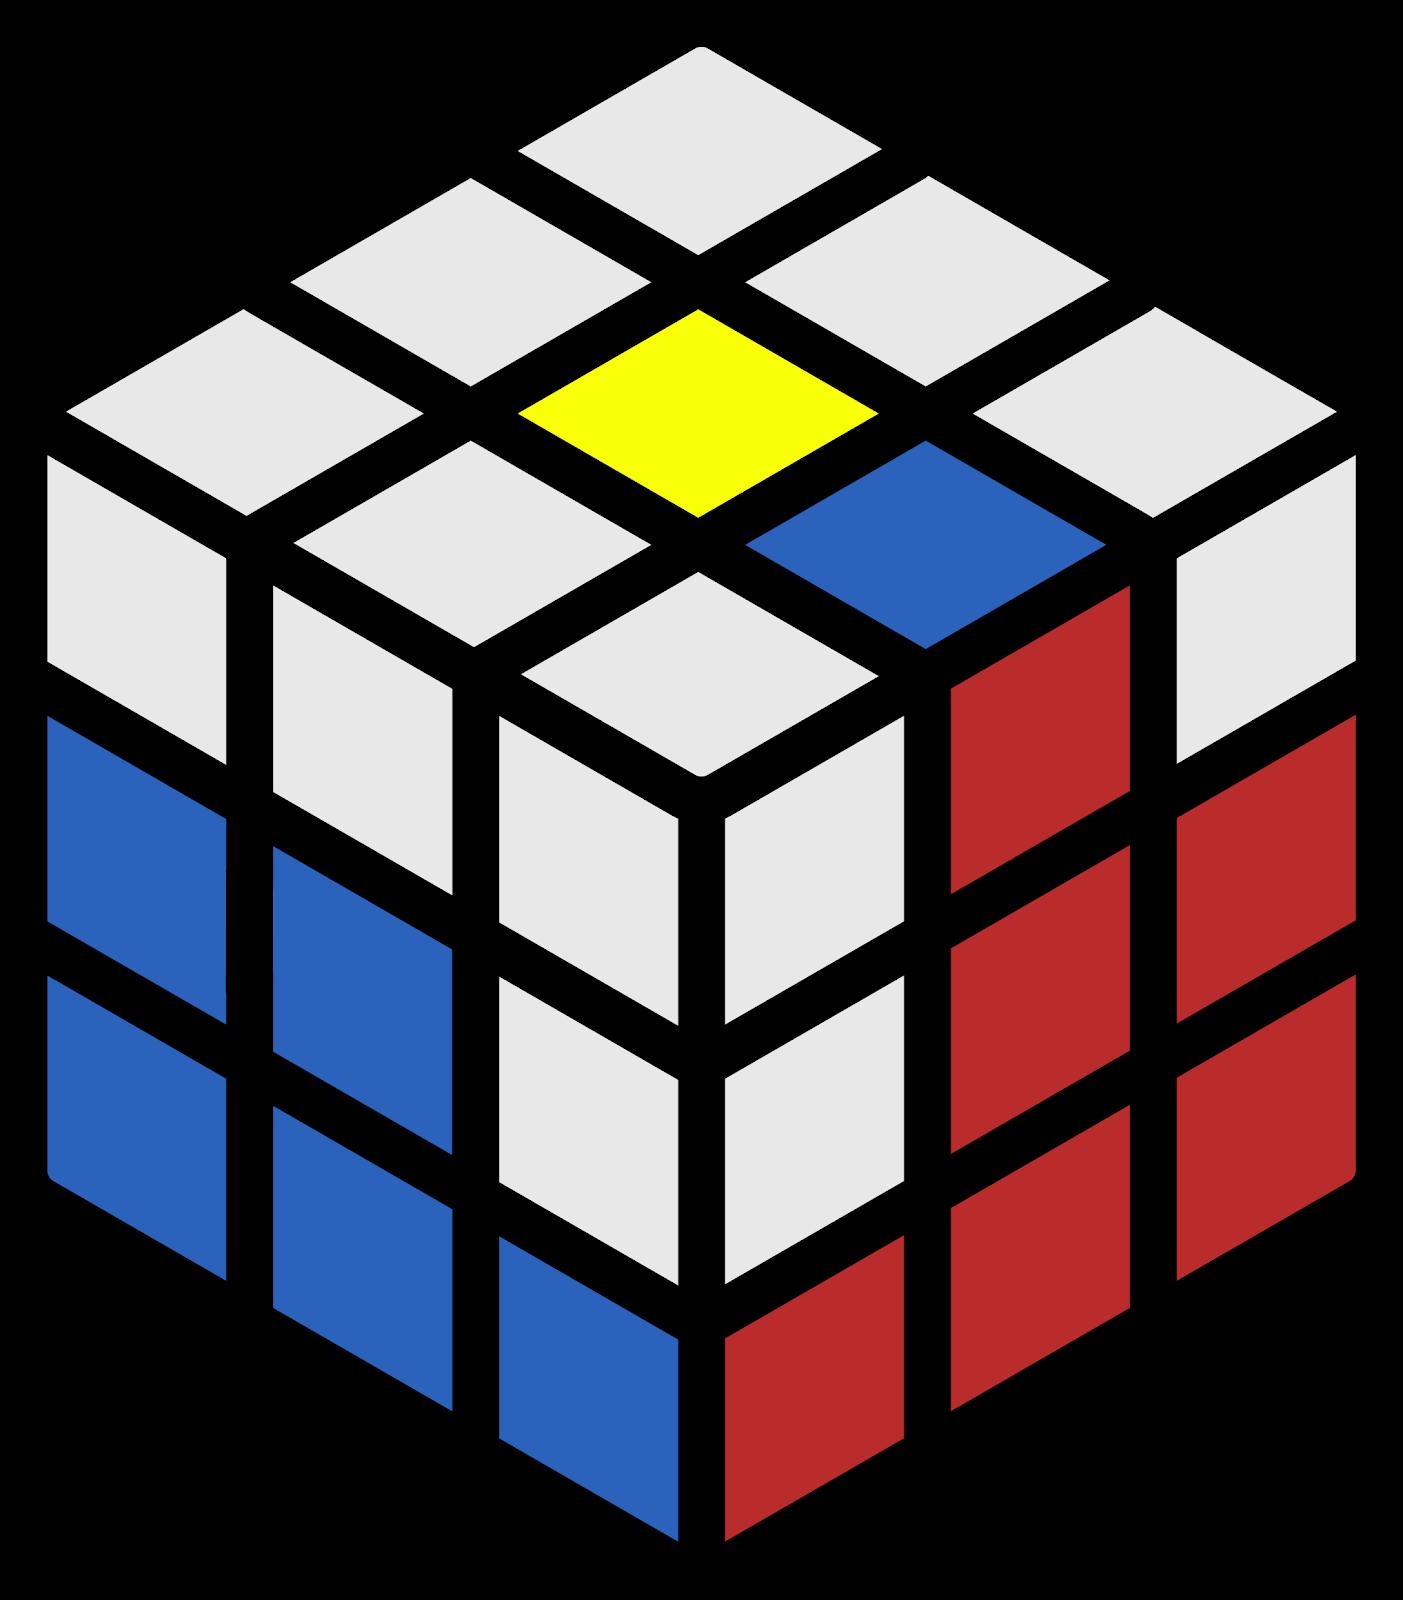 rumus middle layer rubik 3x3 2